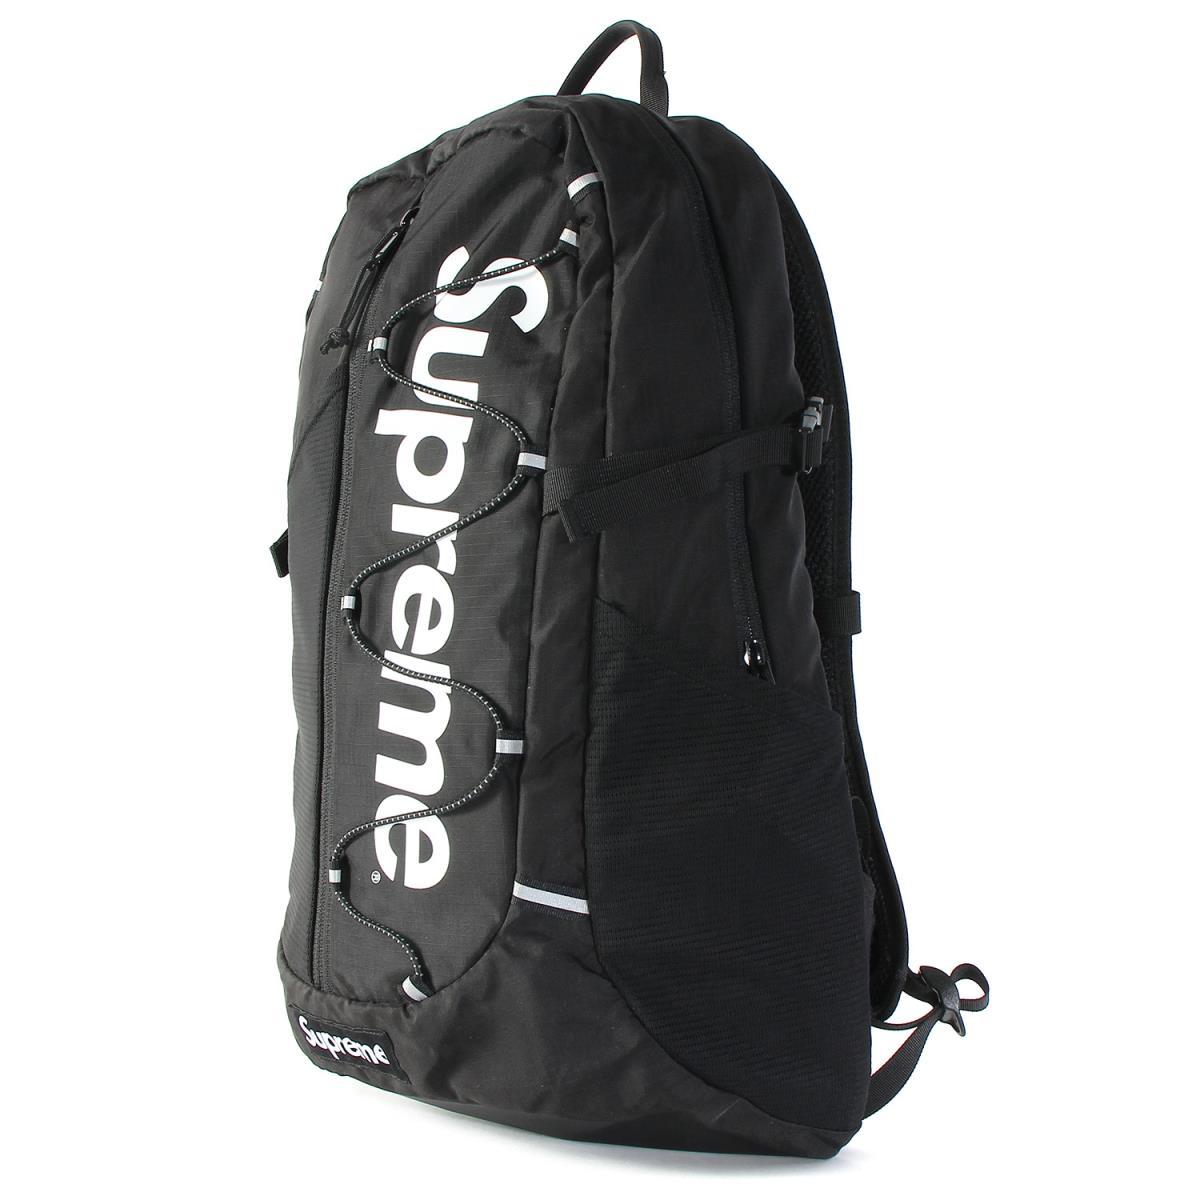 Supreme (シュプリーム) 17S/S ブランドロゴコーデュラリップストップナイロンバックパック(Backpack) ブラック 【メンズ】【美品】【K2214】【中古】【あす楽☆対応可】